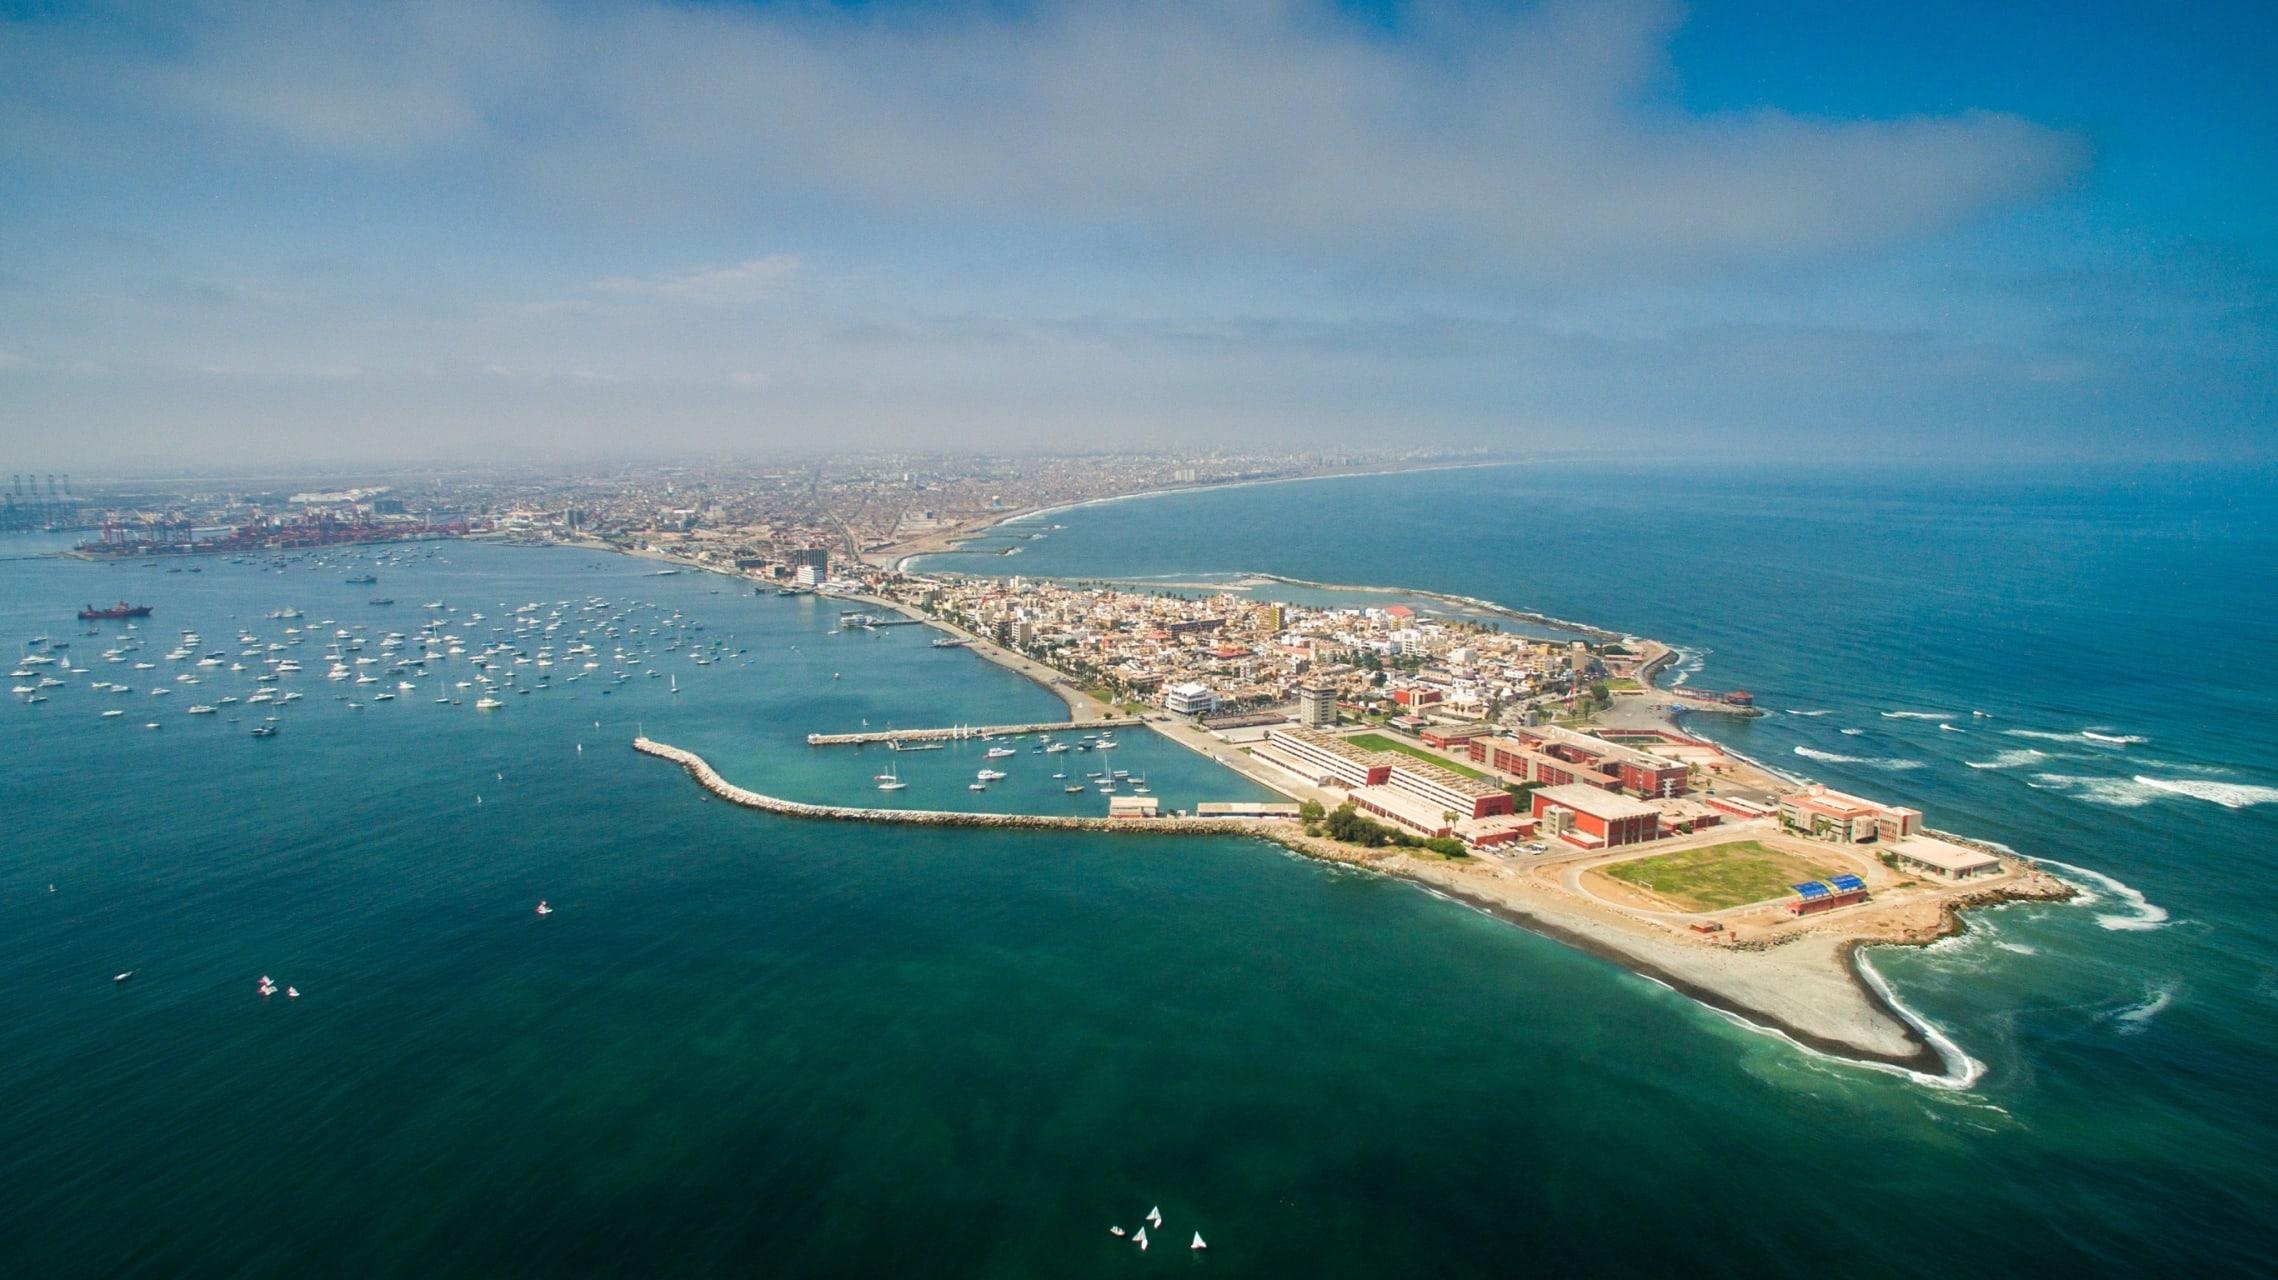 Callao - Callao, the Main Port of Perú: From Real Felipe Colonial Fortress to La Punta Beach